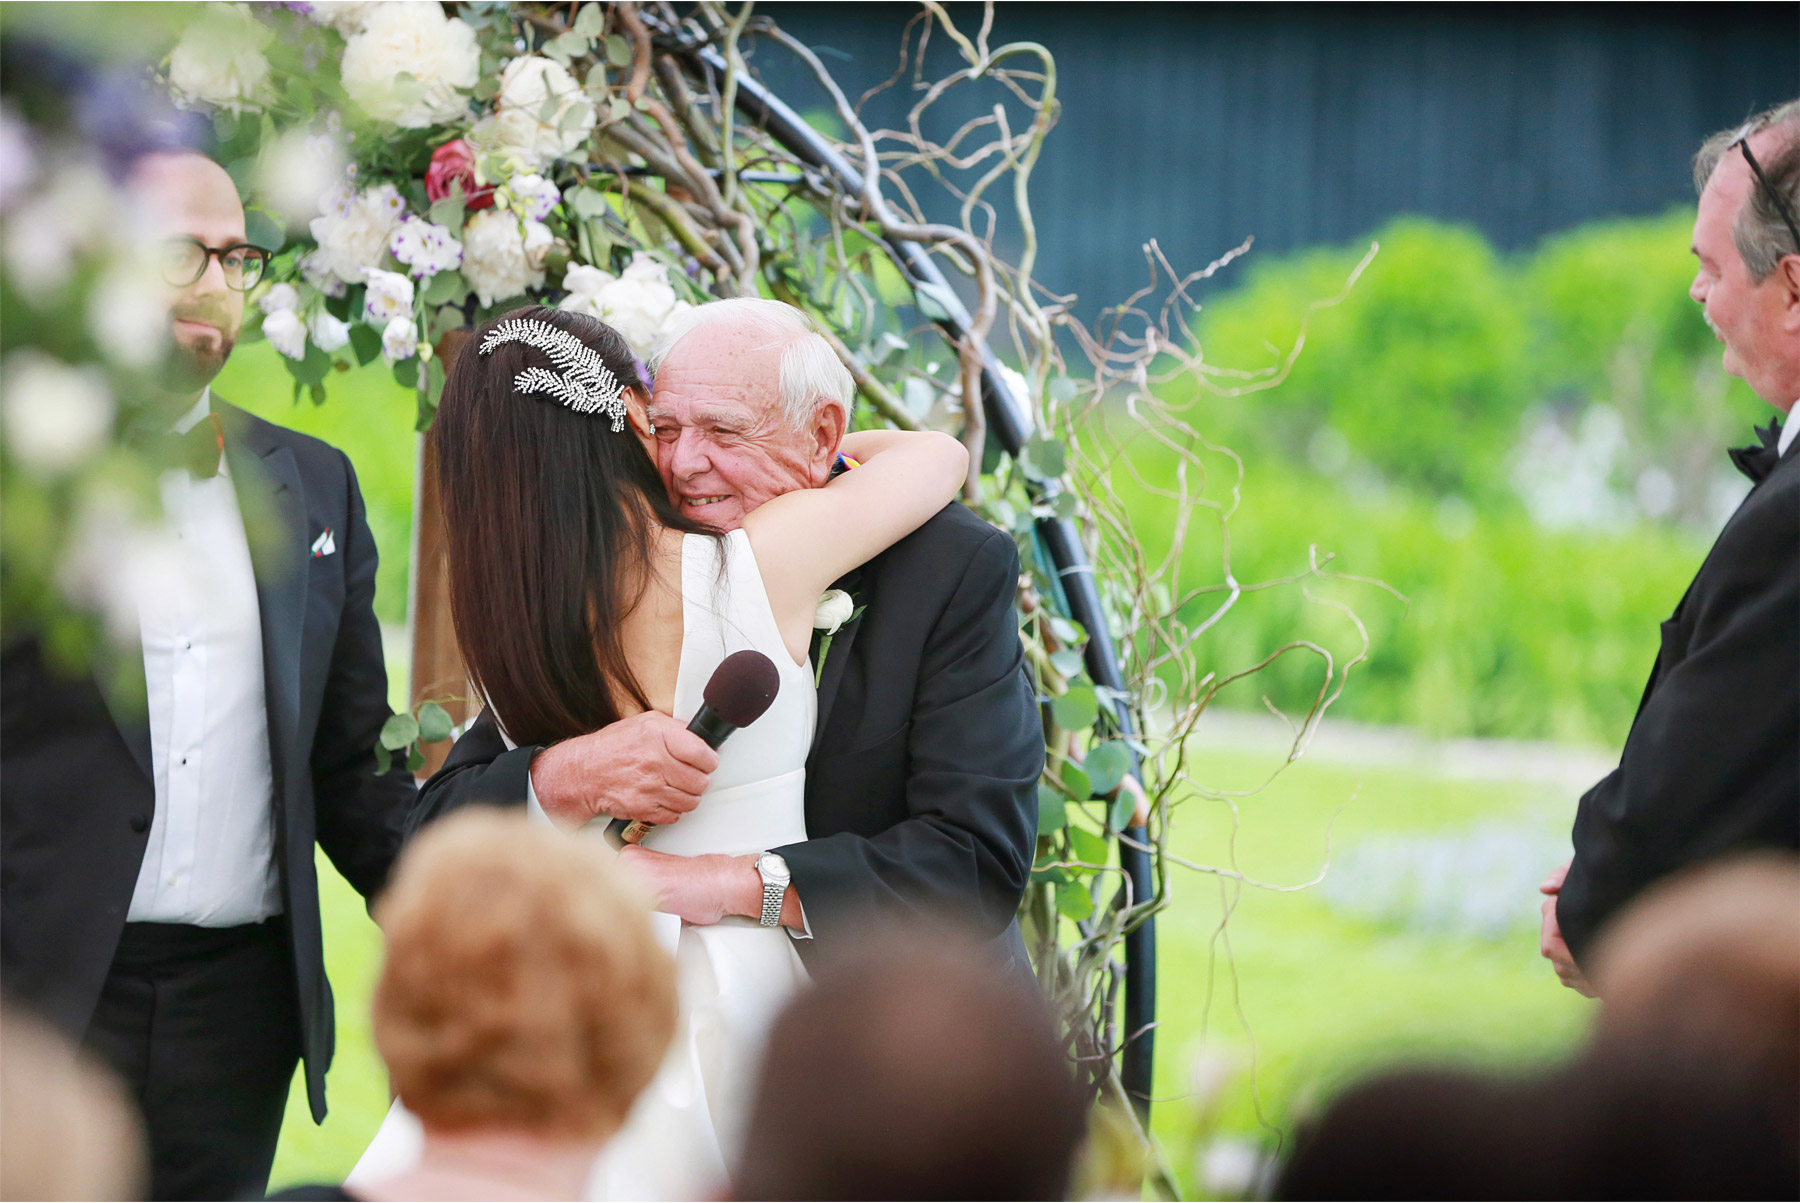 21-Vick-Photography-Wedding-Stouts-Island-Lodge-Wisconsin-Summer-Reception-Outdoor-Toast-Hug-MiJa-and-Lucius.jpg